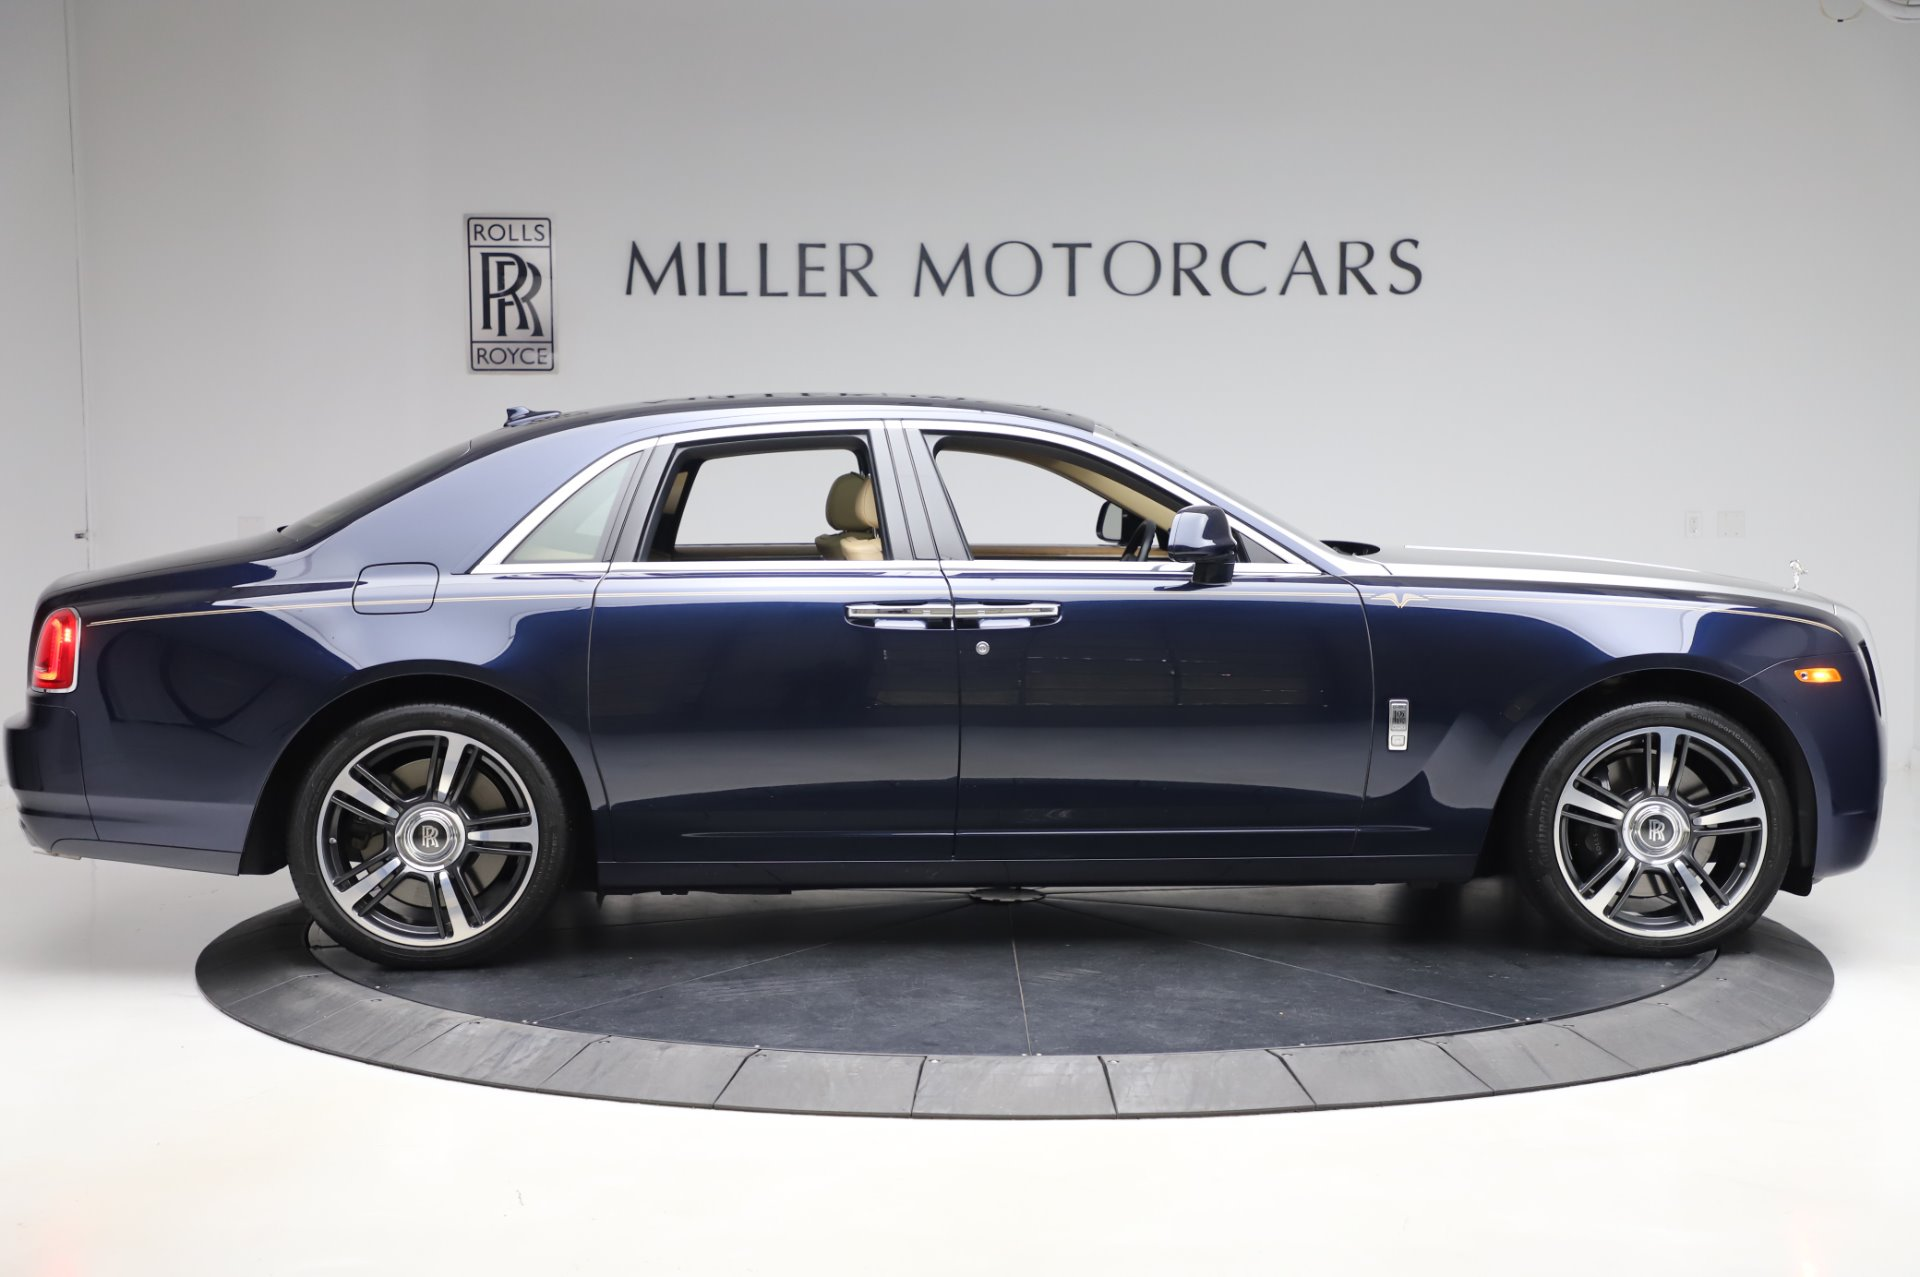 Used 2014 Rolls-Royce Ghost V-Spec For Sale In Westport, CT 858_p7